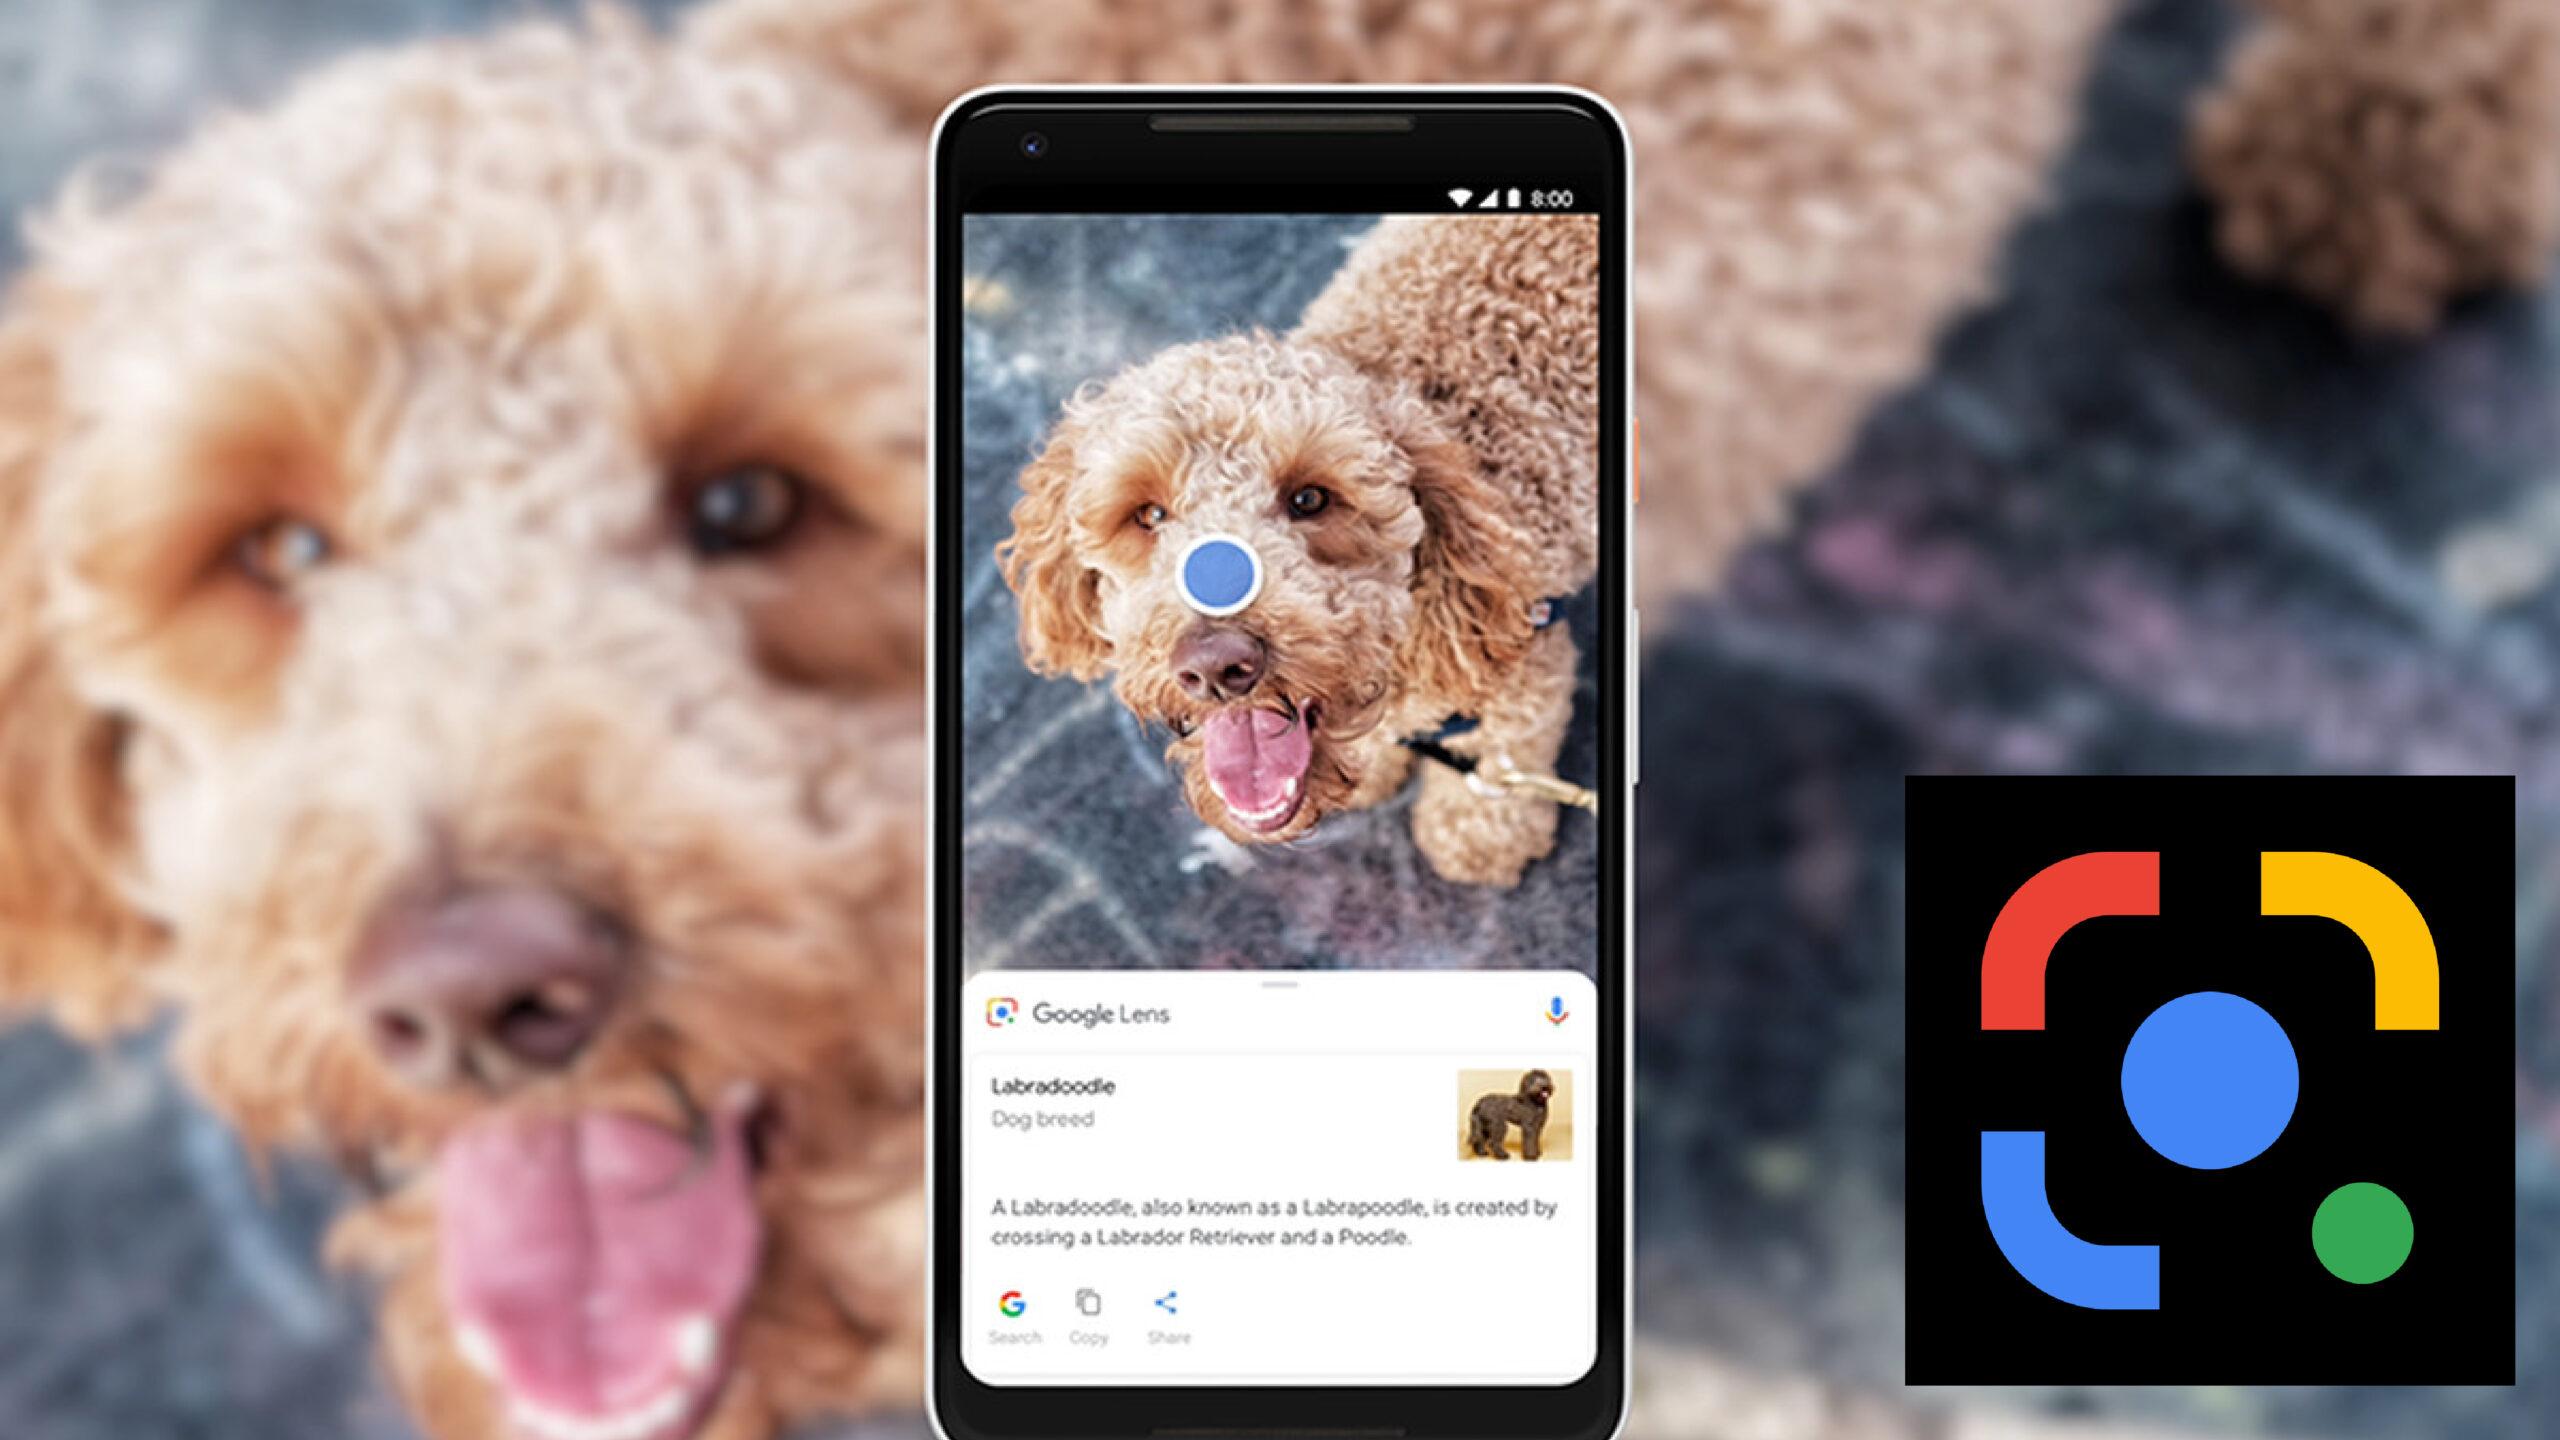 Google Lens allows automatic translation of screenshots